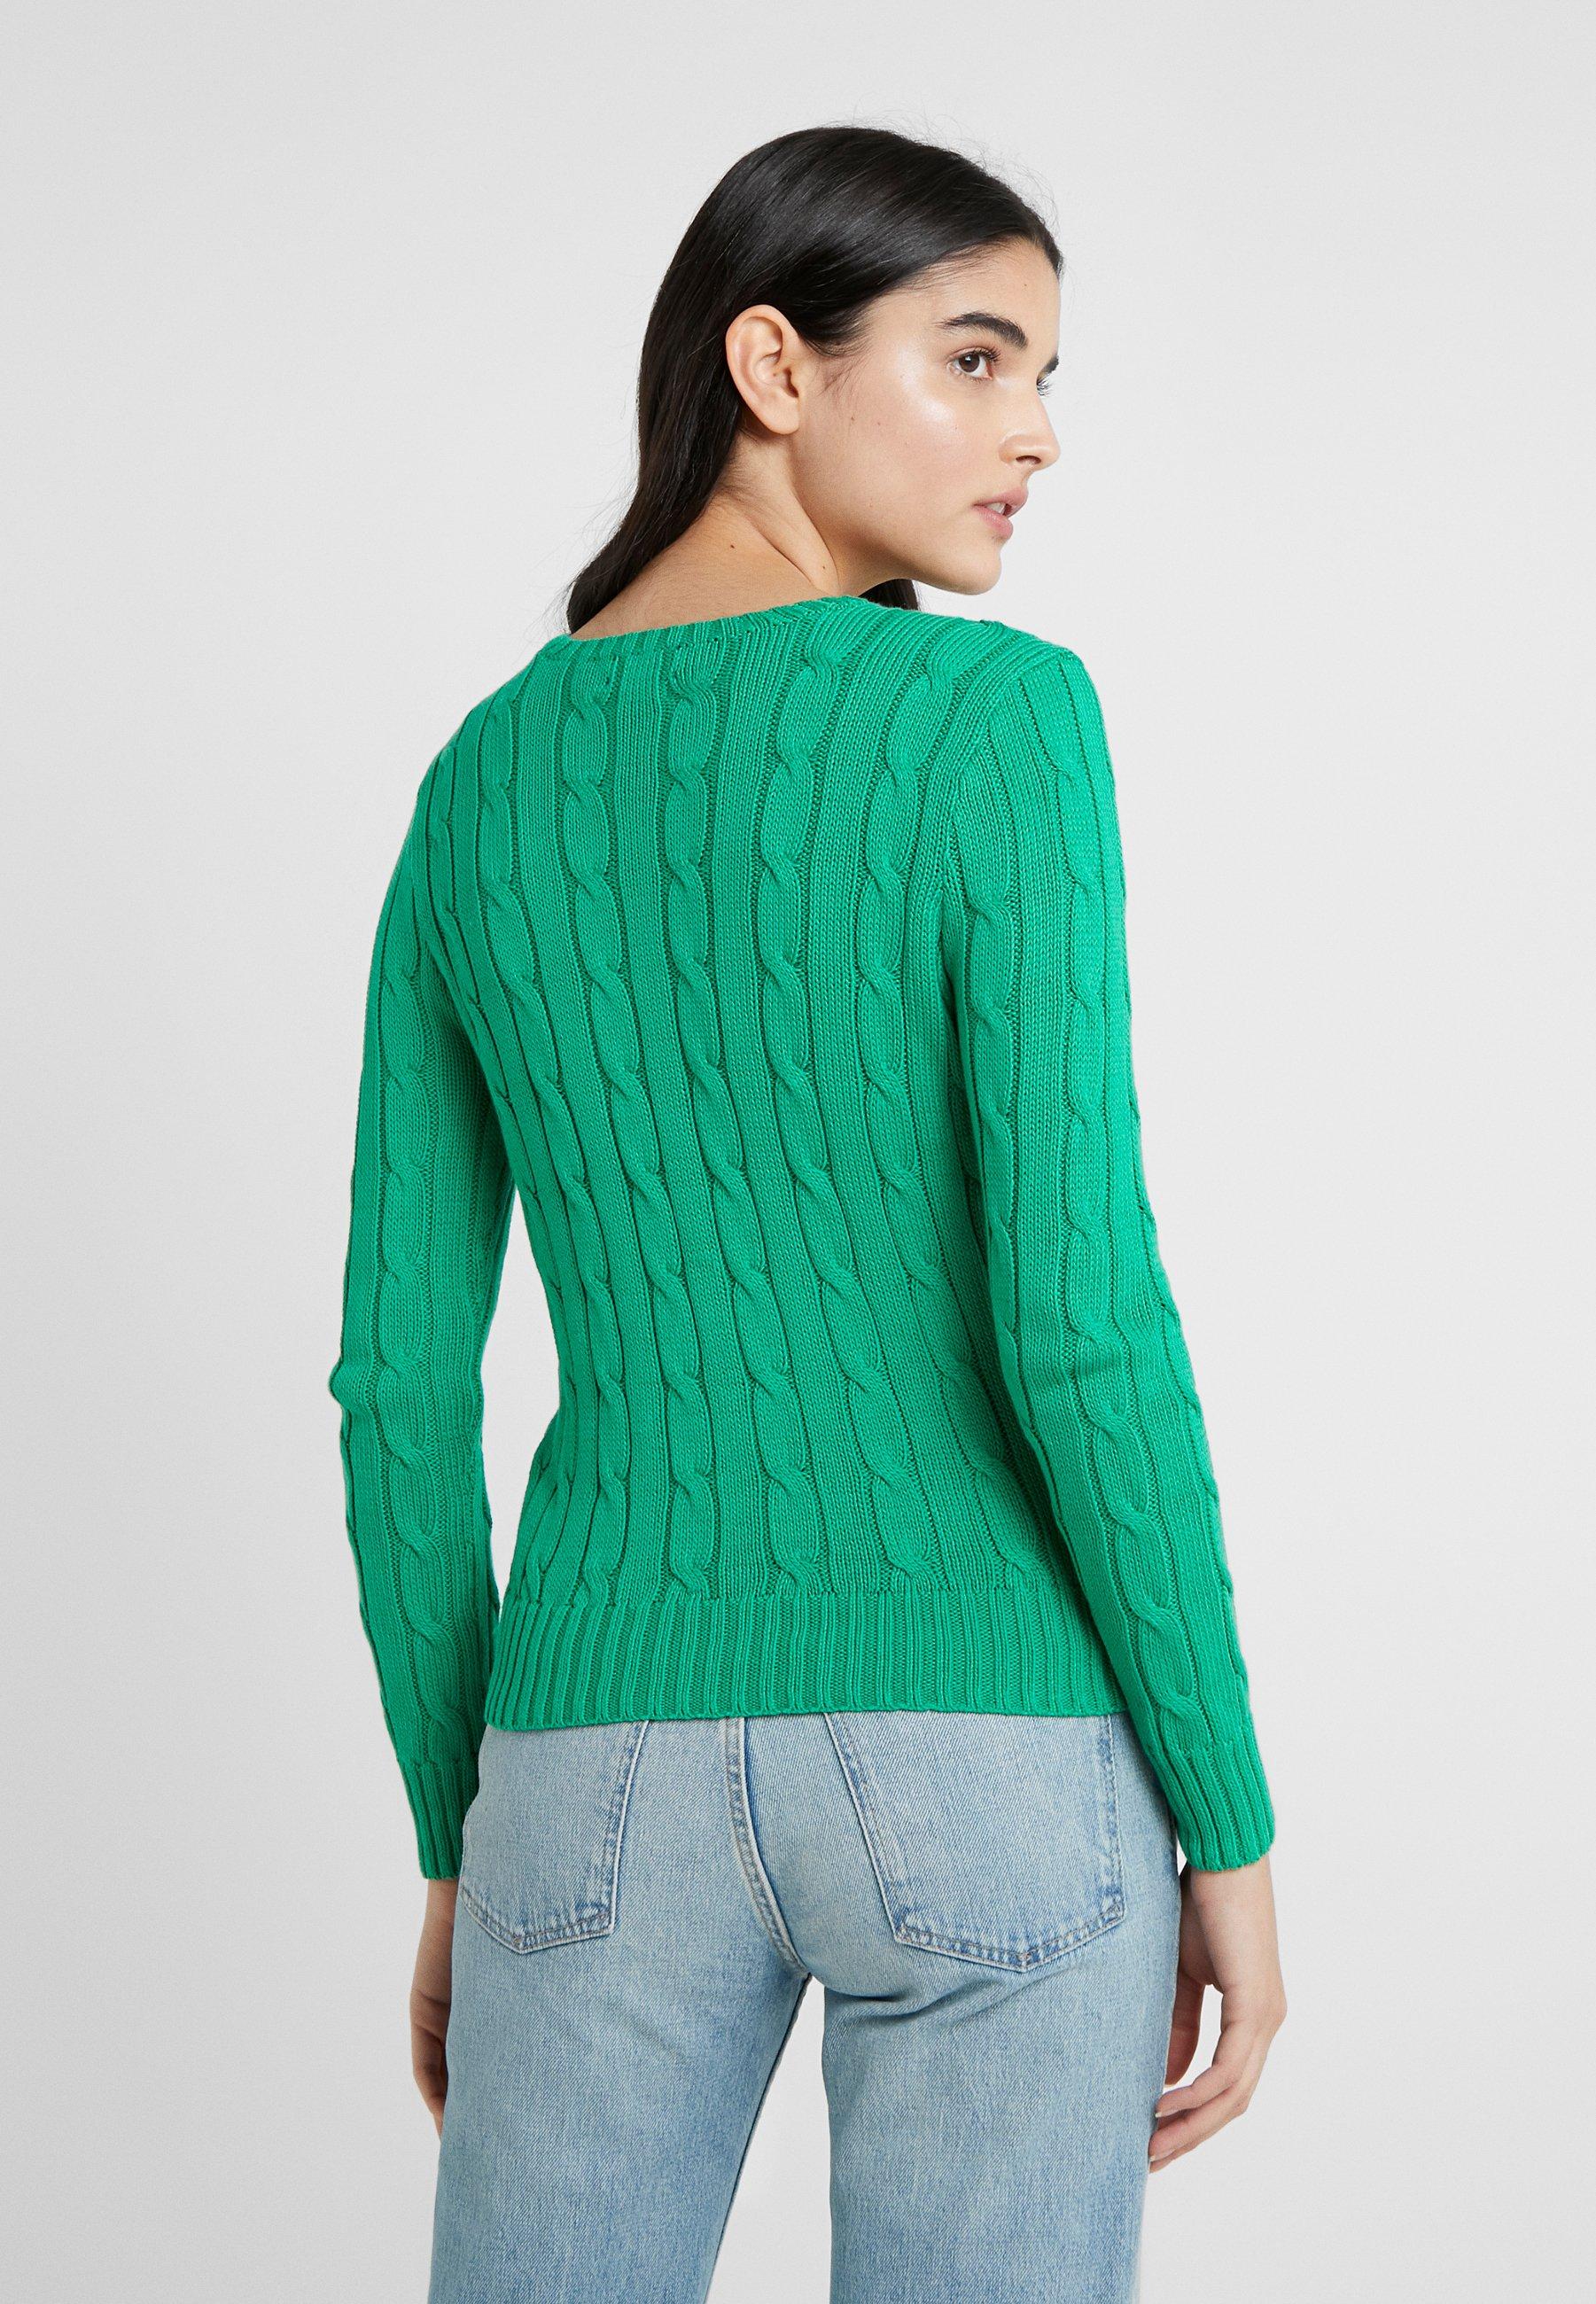 Polo Ralph Lauren Julianna Classic Long Sleeve - Maglione Preppy Green UoFKFGT